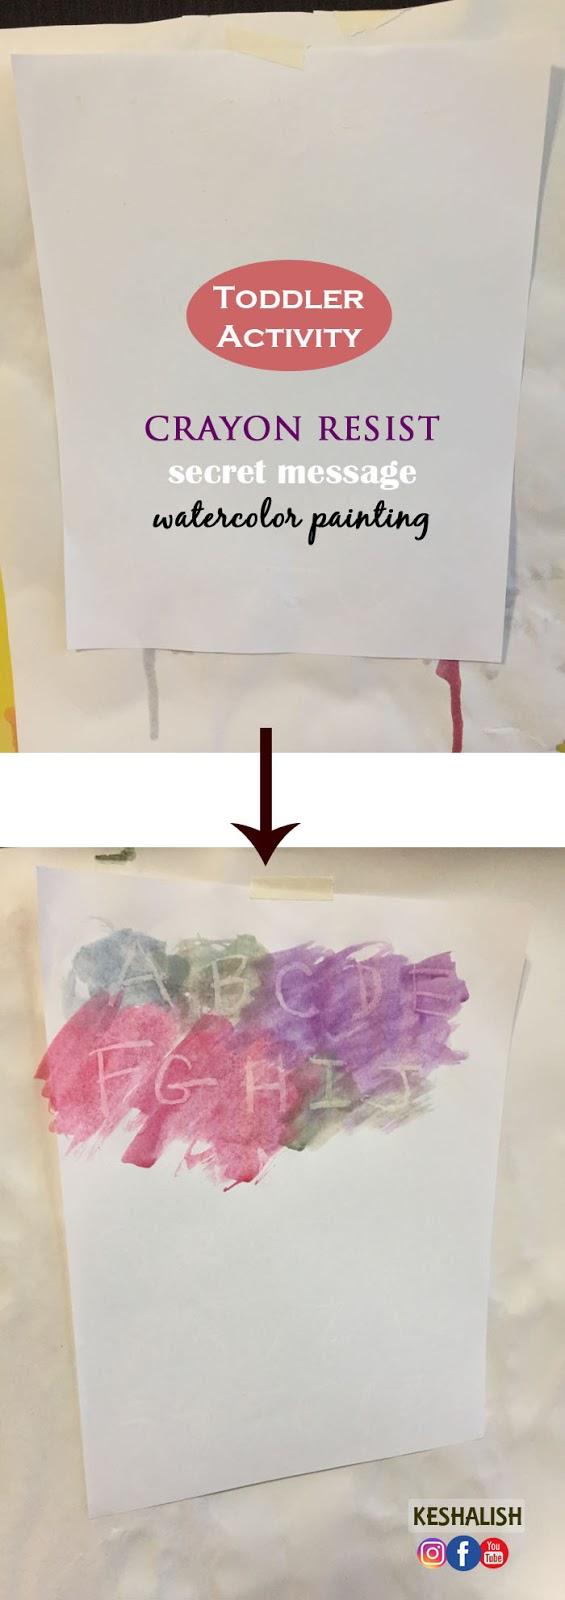 keshalish: Crayon Resist Secret Message Watercolor Painting